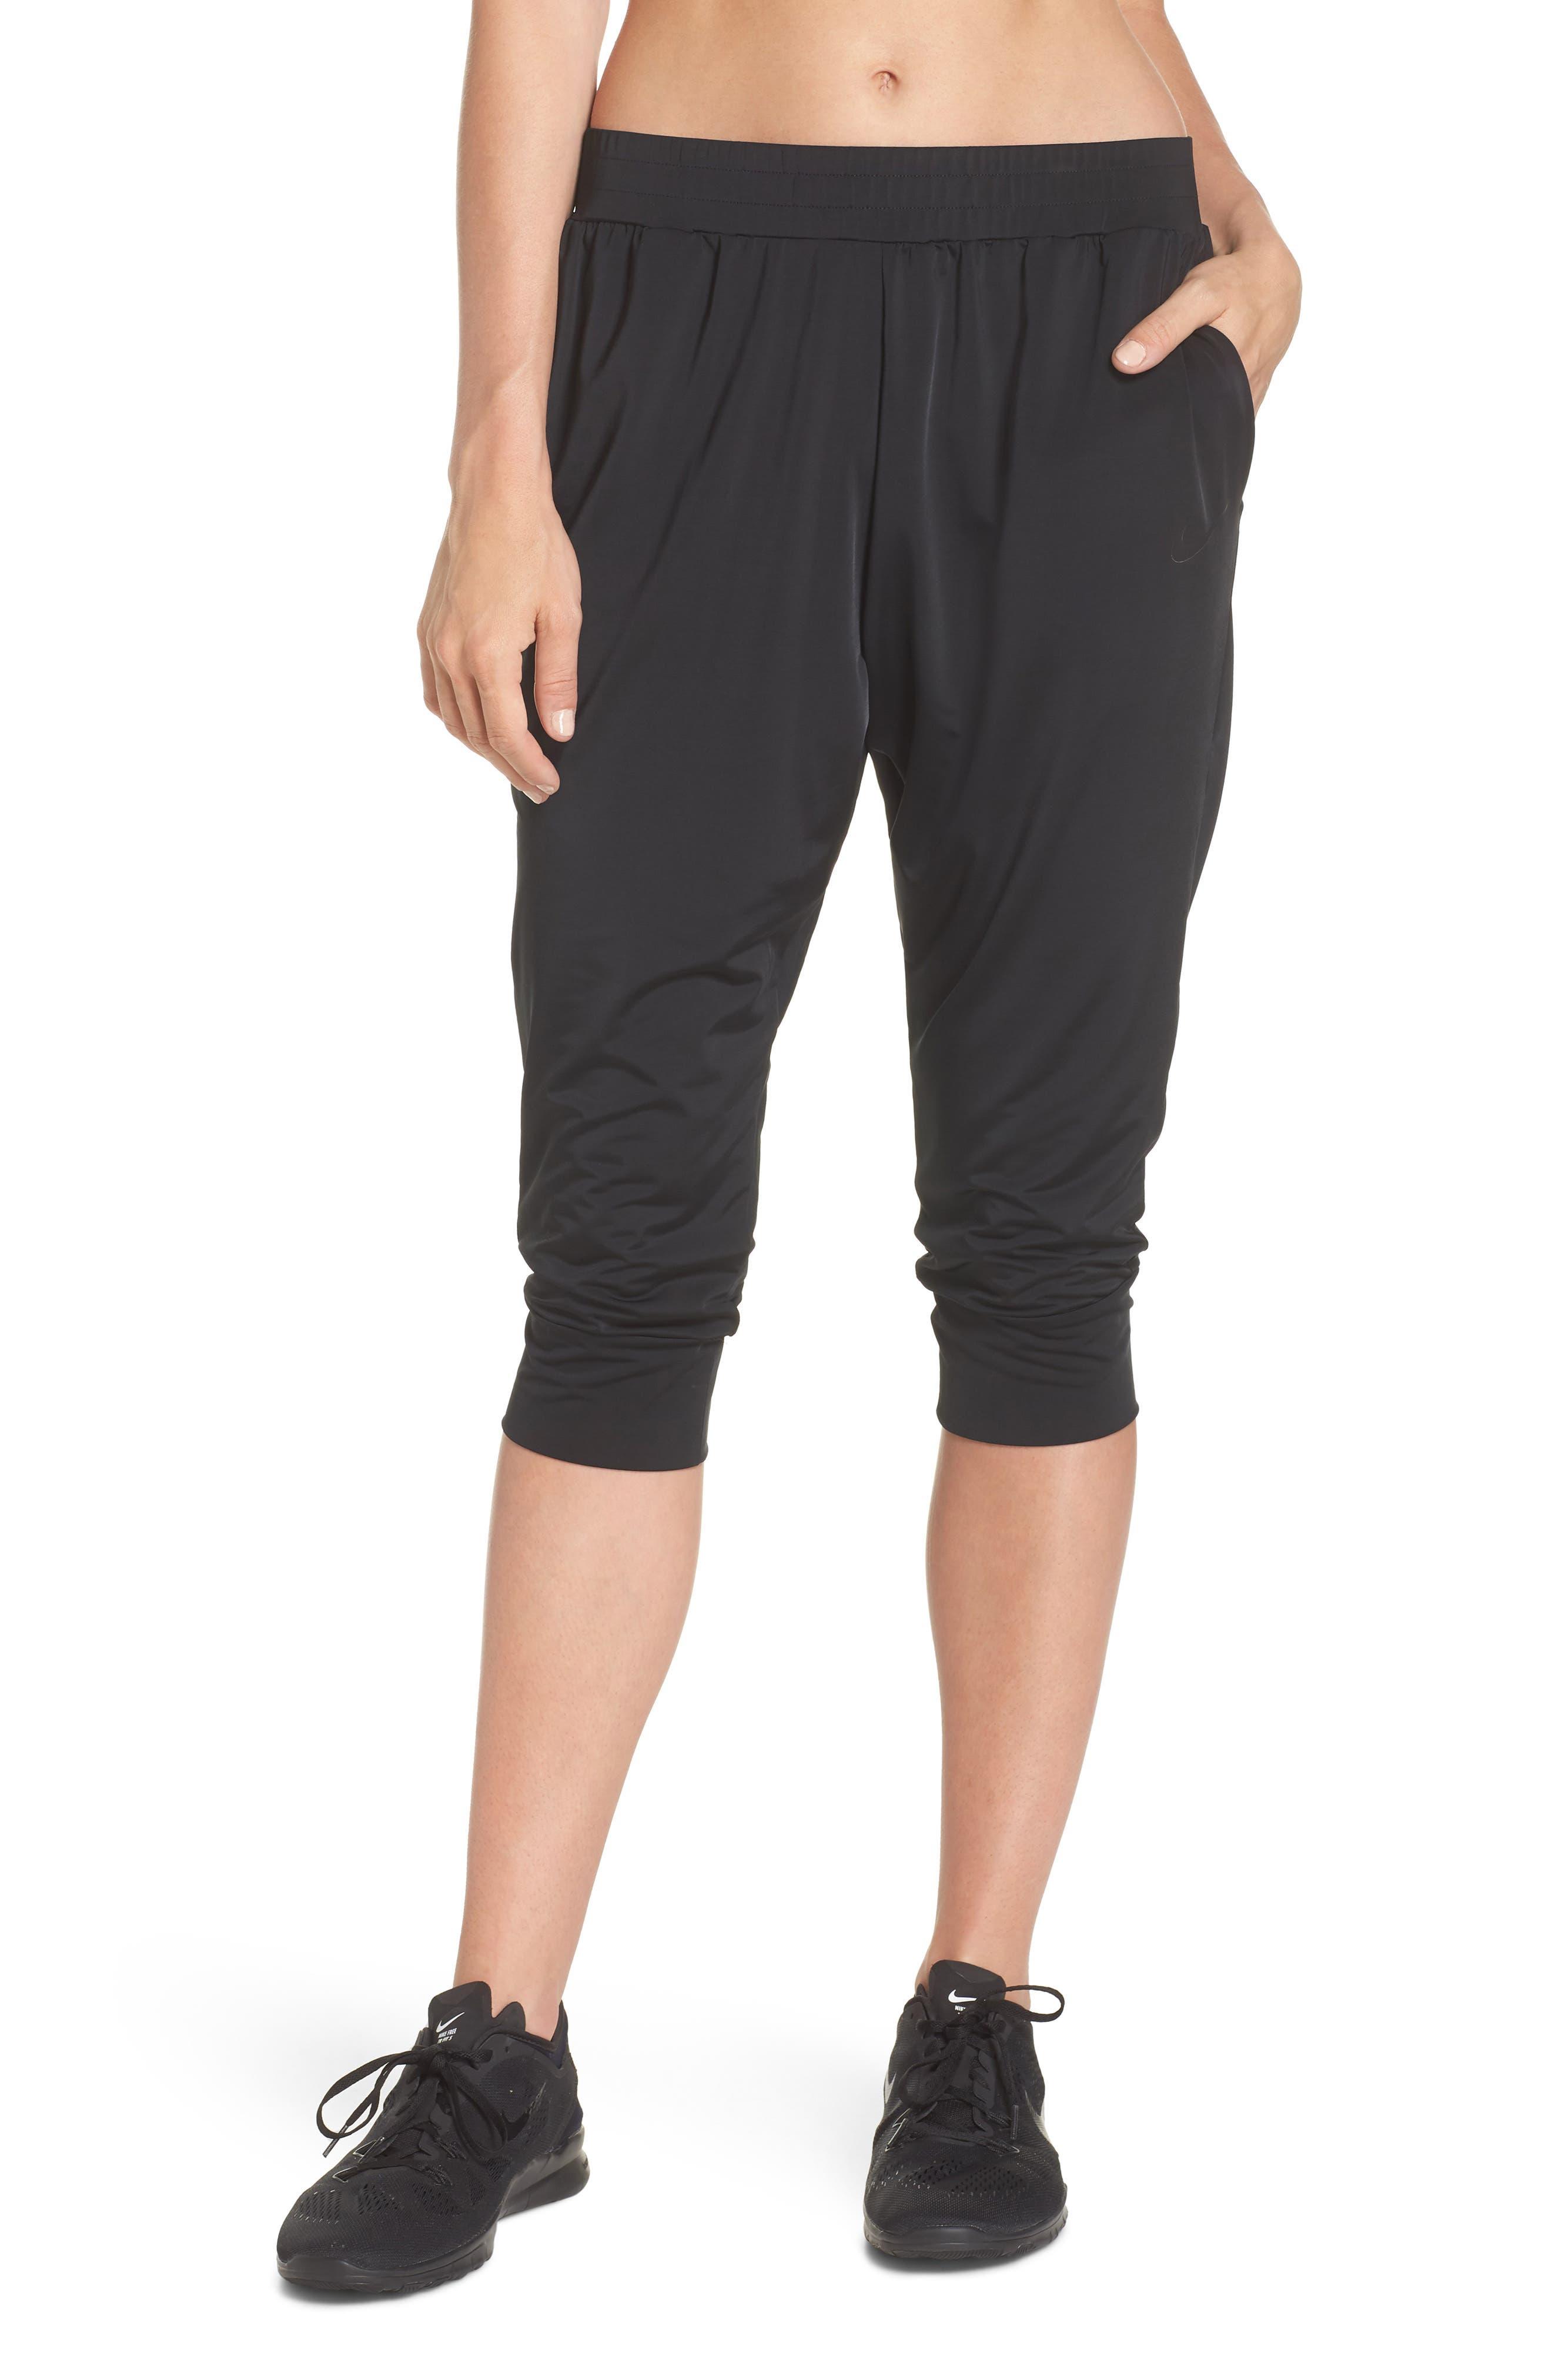 Dry Touch Training Pants,                         Main,                         color, Black/ Black